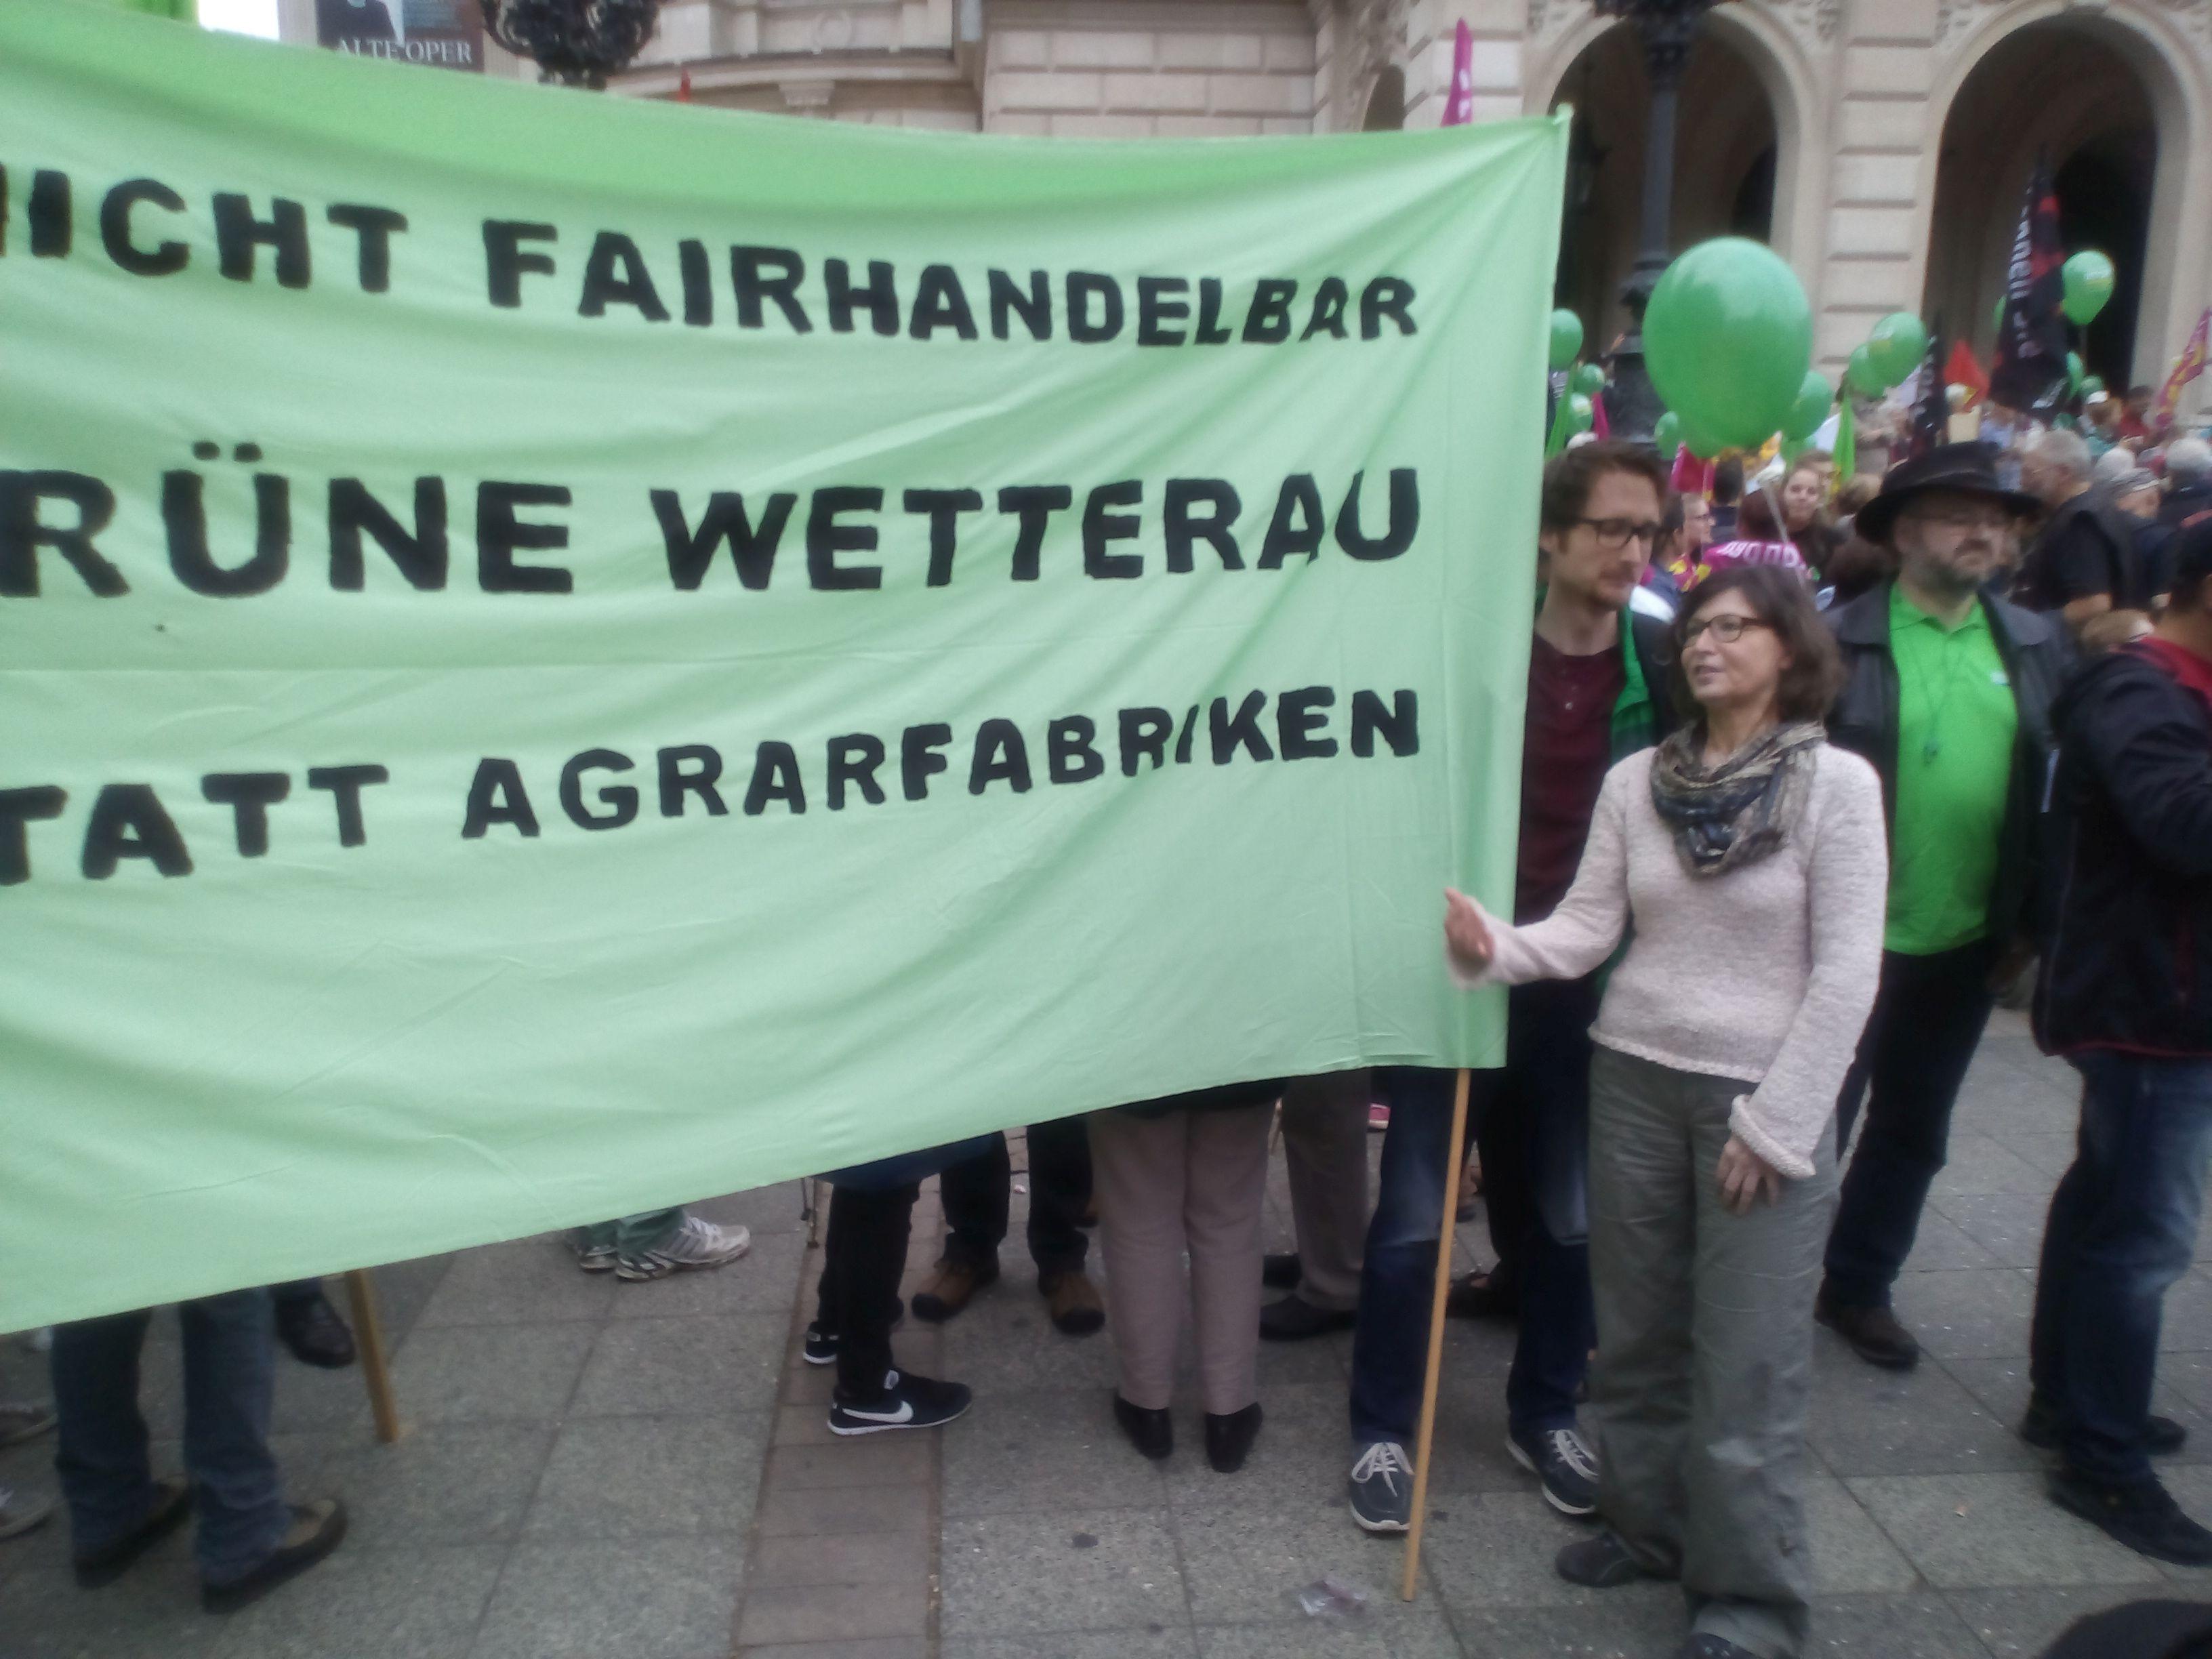 Wetterau1